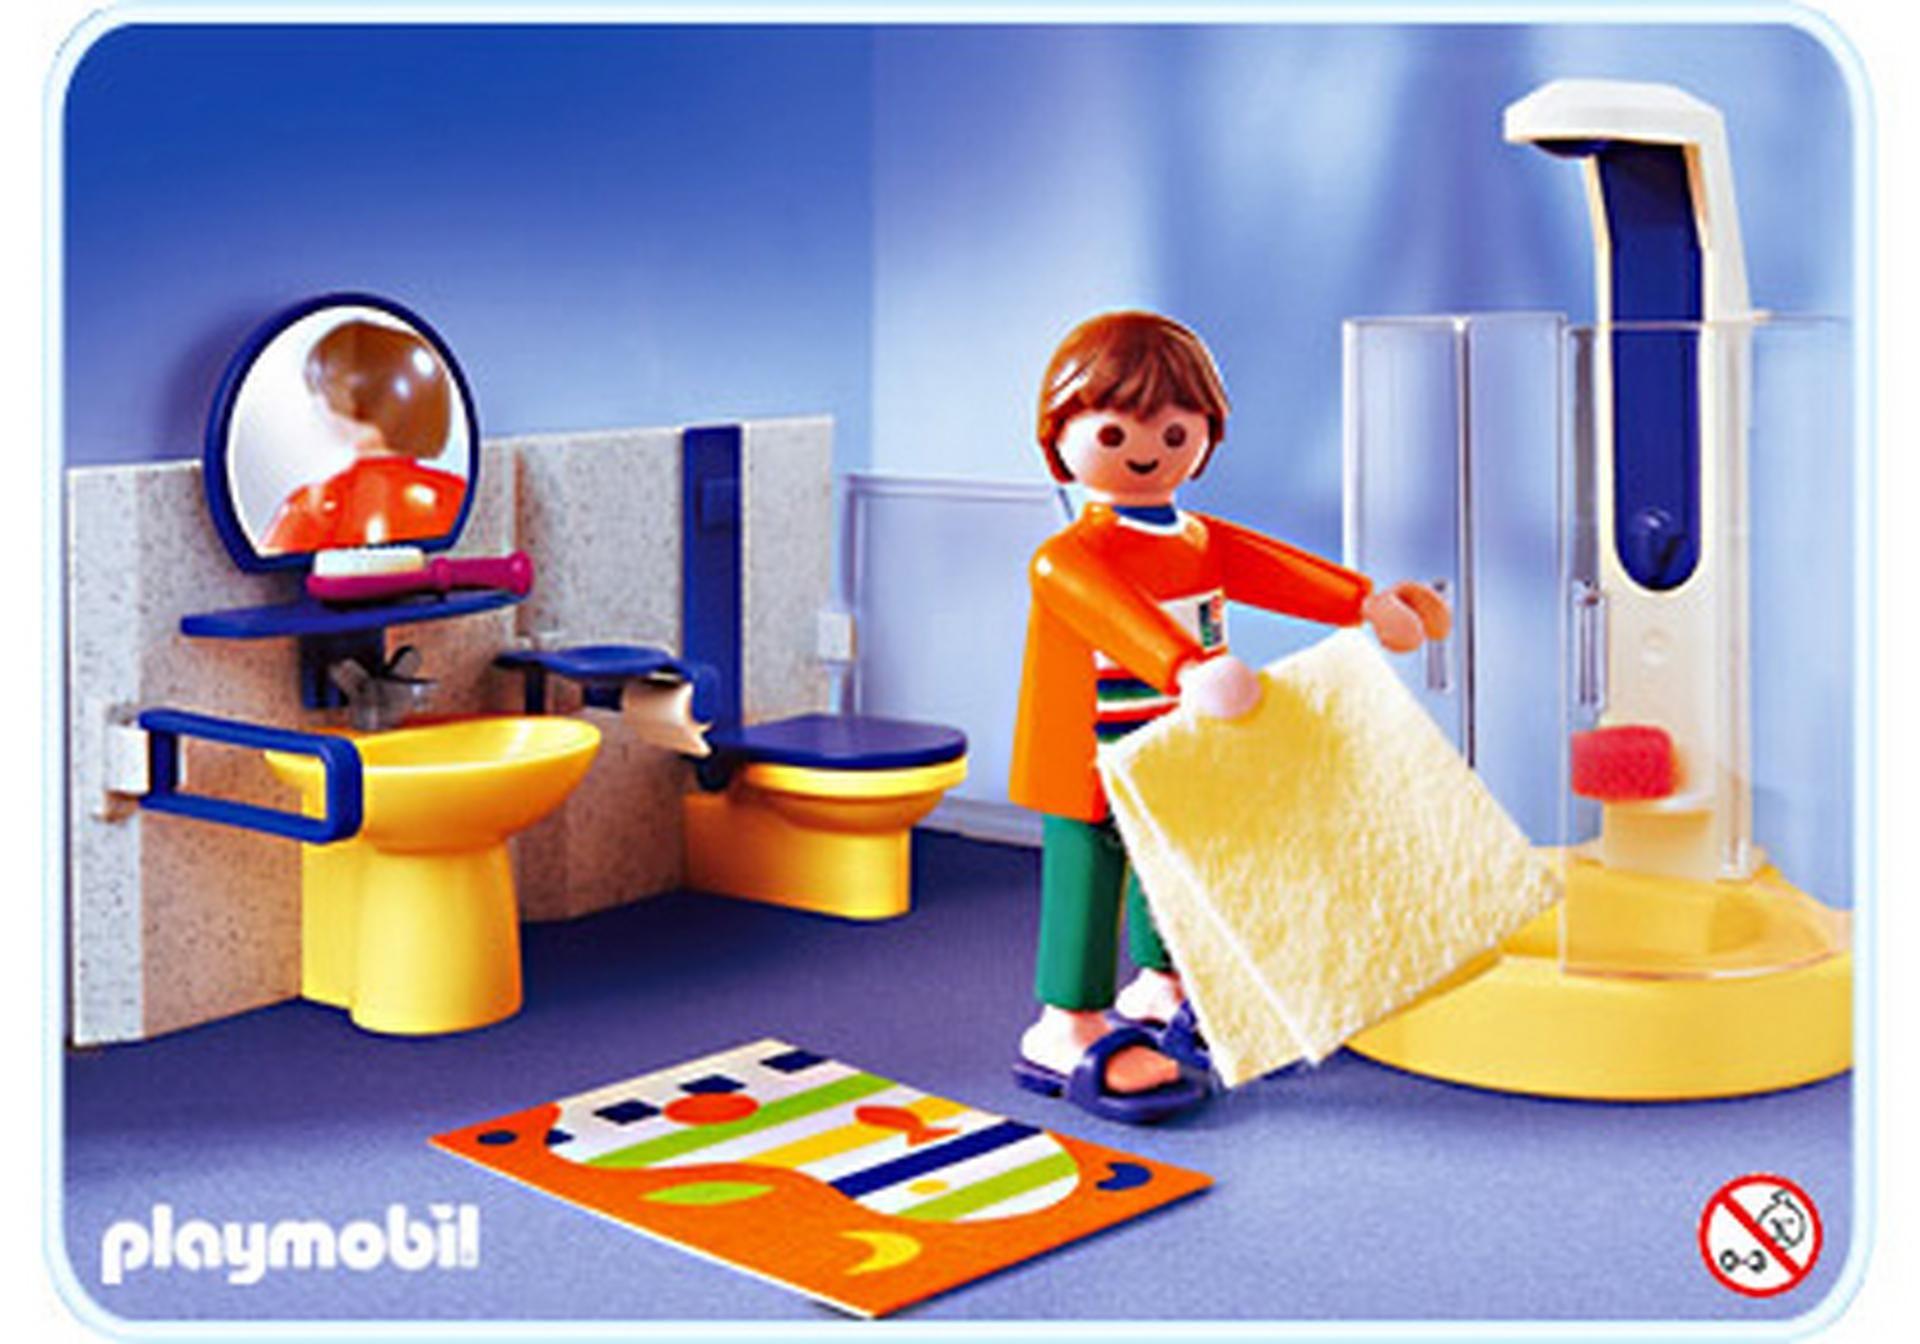 Playmobil 3969 Bad Mit Dusche Http Www Playmodb Org Cgi Bin Showinv Pl Setnum 3969 Playmobil Playmobil Badezimmer Dusche